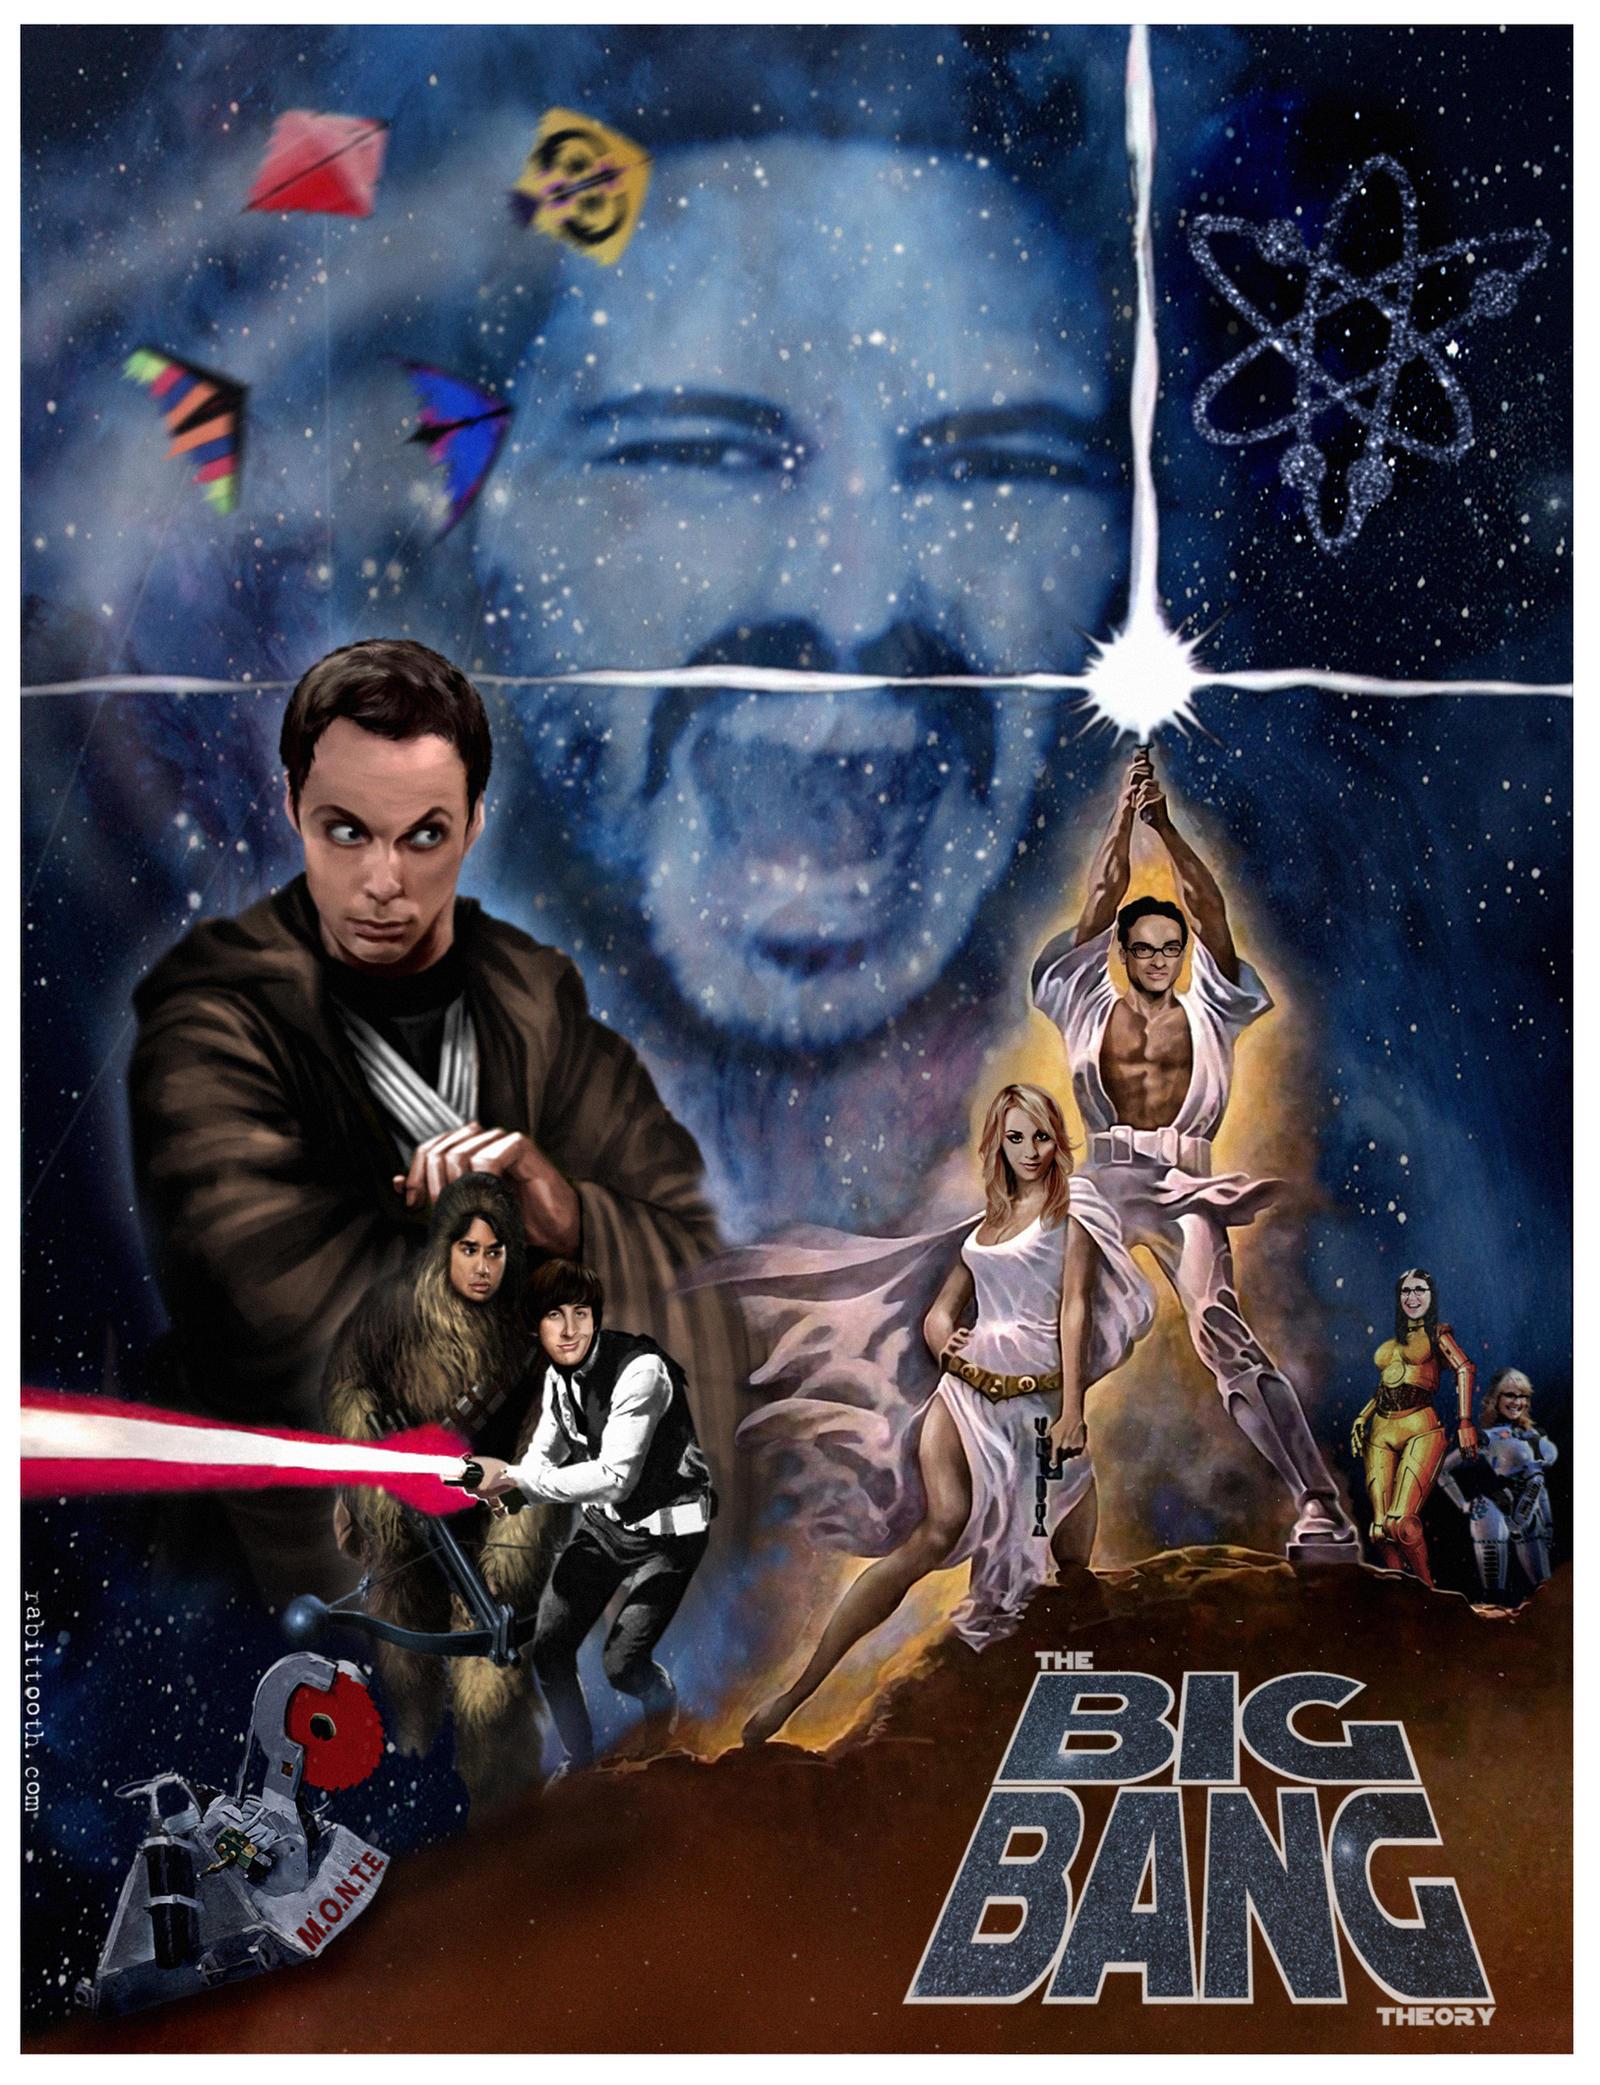 Funny big bang theory pictures 27 pics -  Big Bang Theory Star Wars Poster By Rabittooth